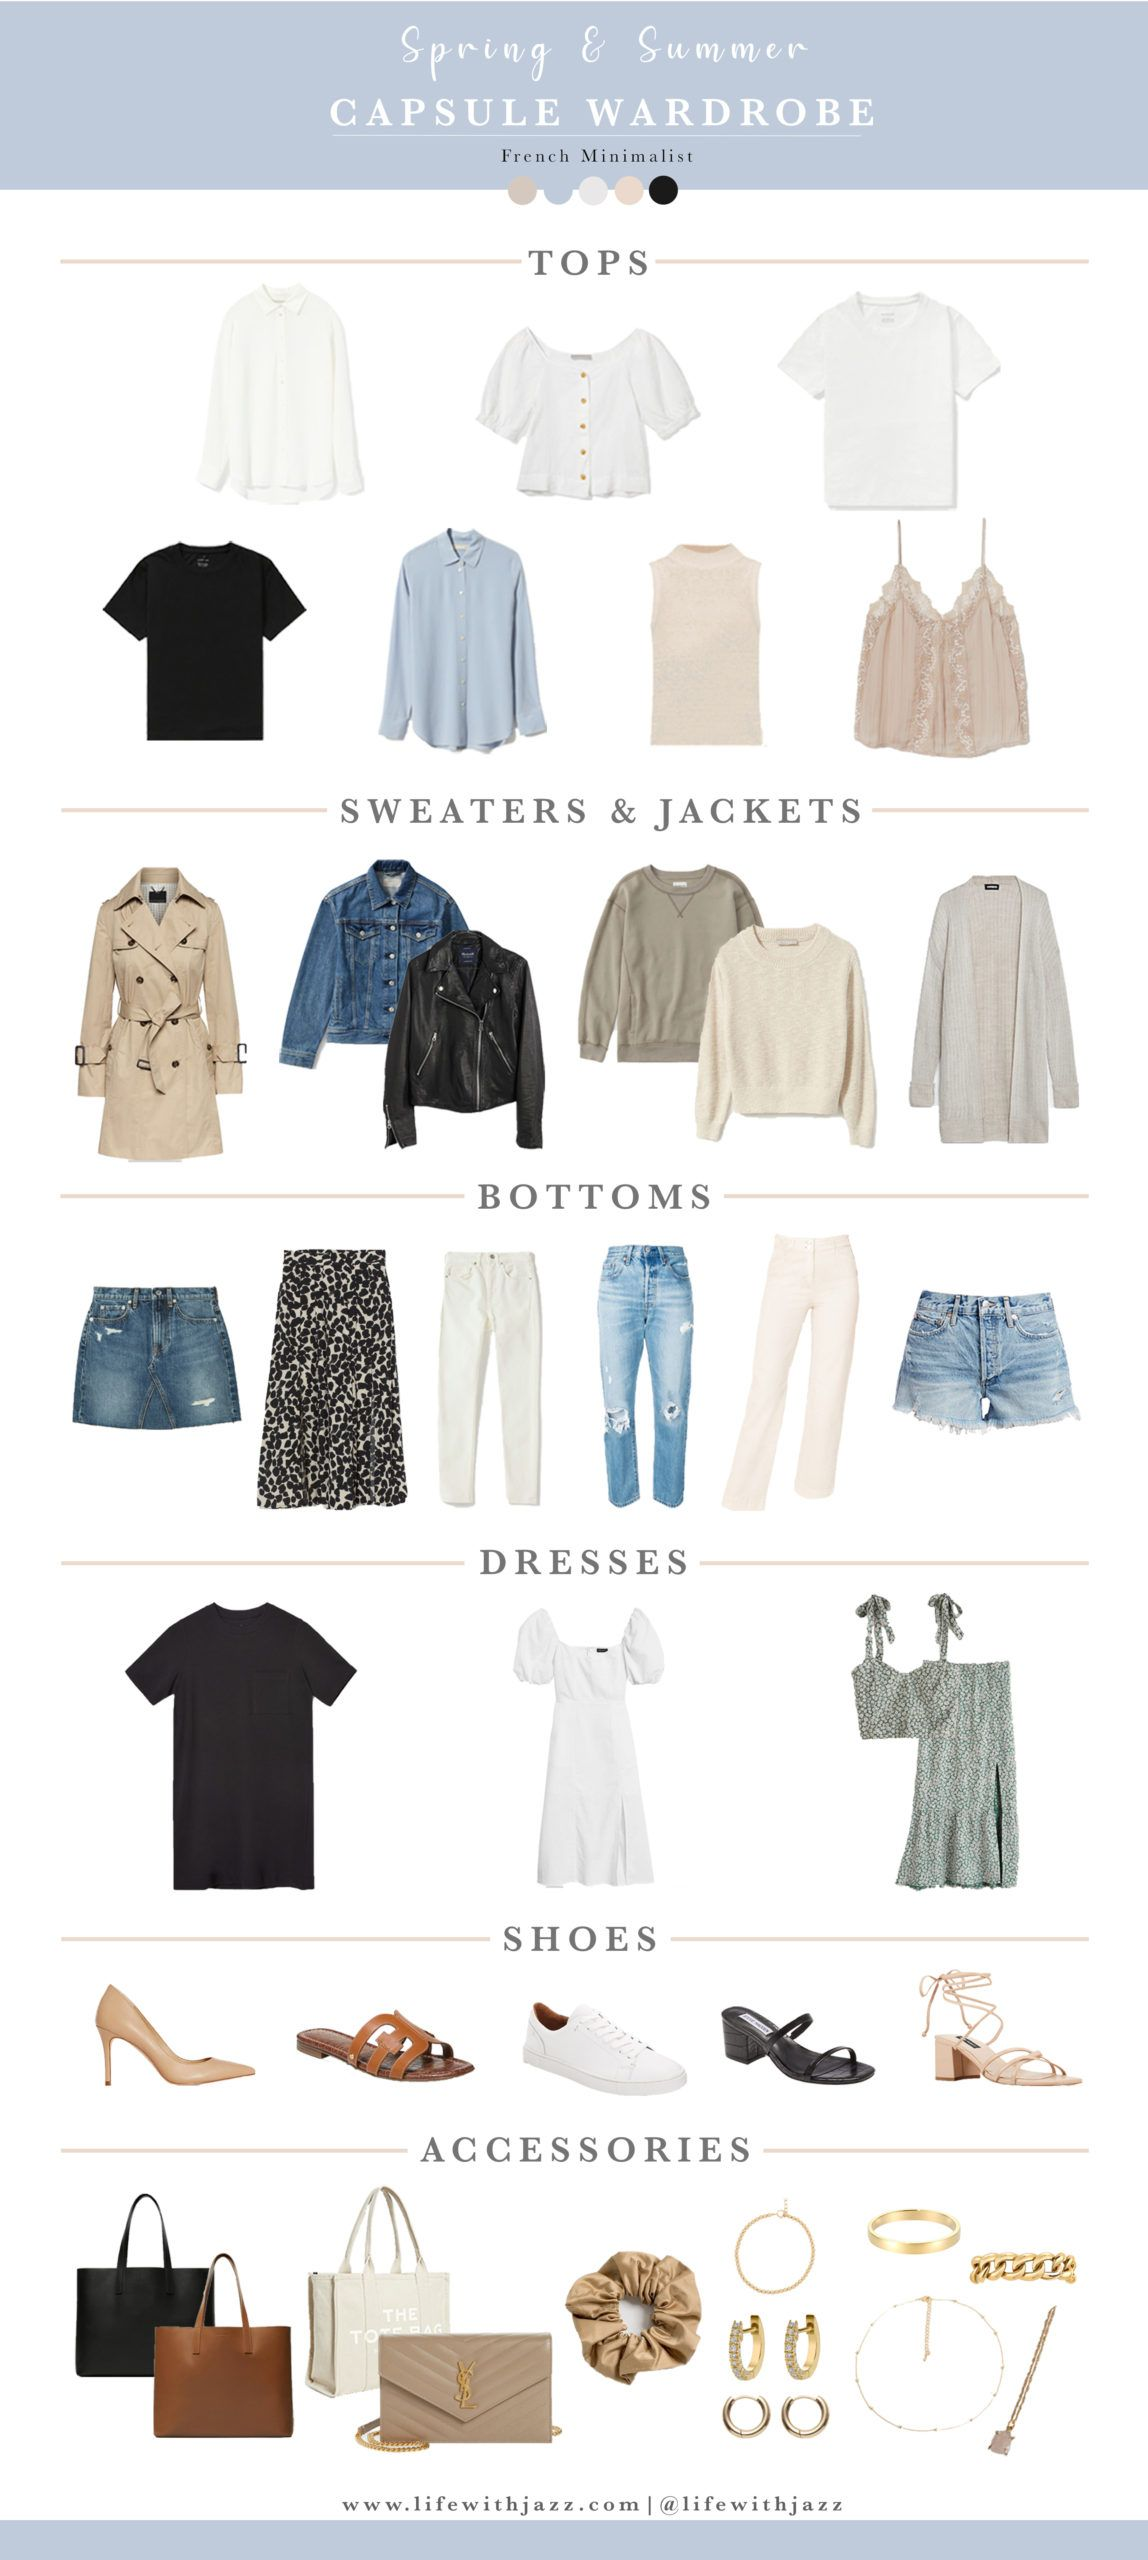 Spring/Summer 2020 Capsule Wardrobe